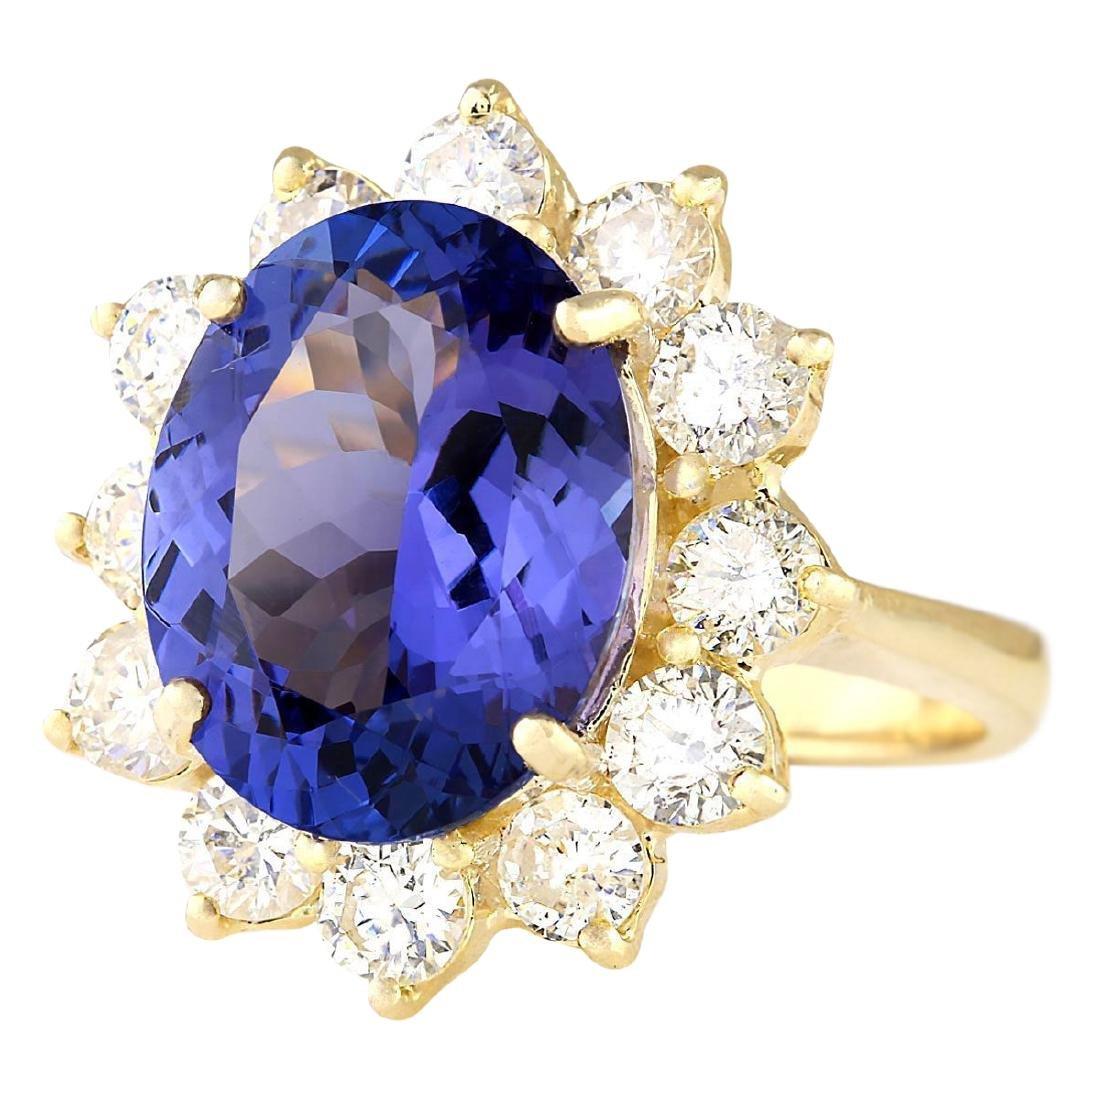 10.50 CTW Natural Blue Tanzanite And Diamond Ring 18K - 2